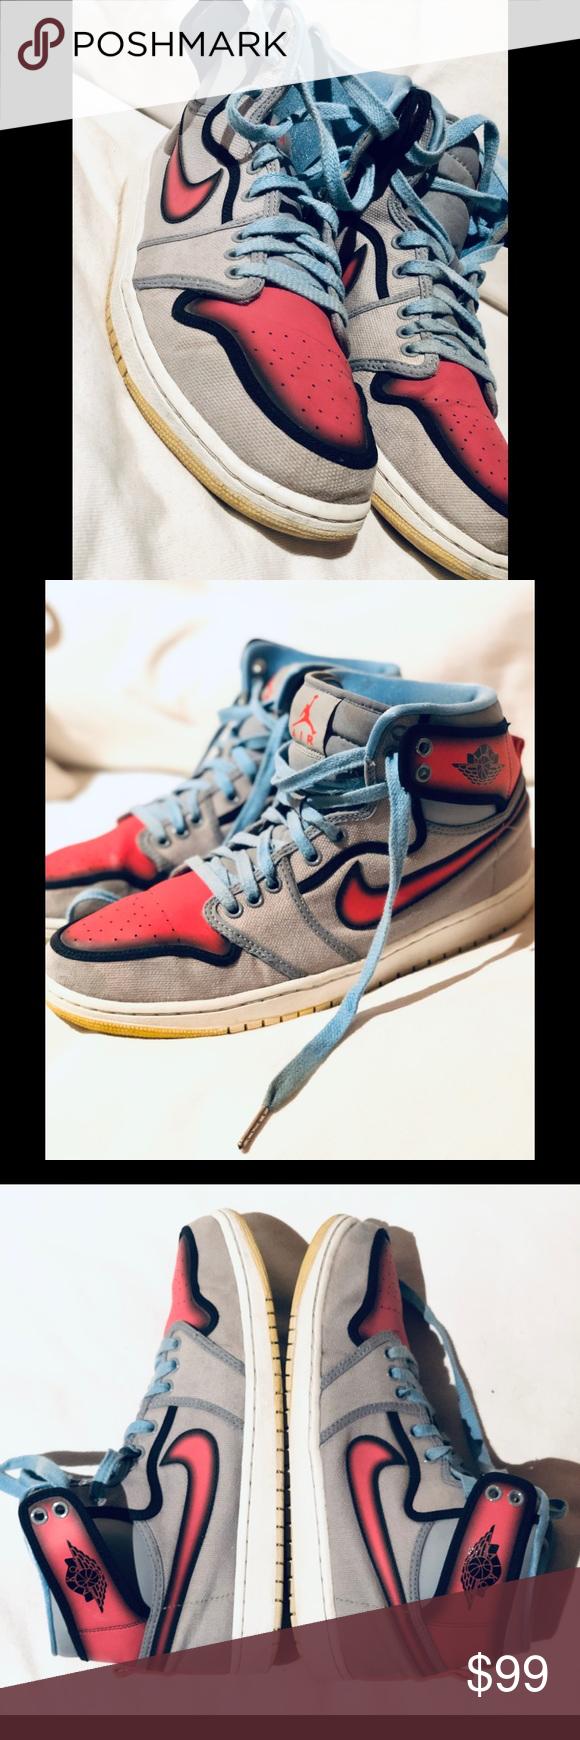 Nike Air Jordan 1 Retro Ko Hi Rttg Barcelona 11 5 Pre Owned Gently Worn And In Very Good Condition Pics Are Very Accurat Air Jordans Nike Air Jordan Nike Air